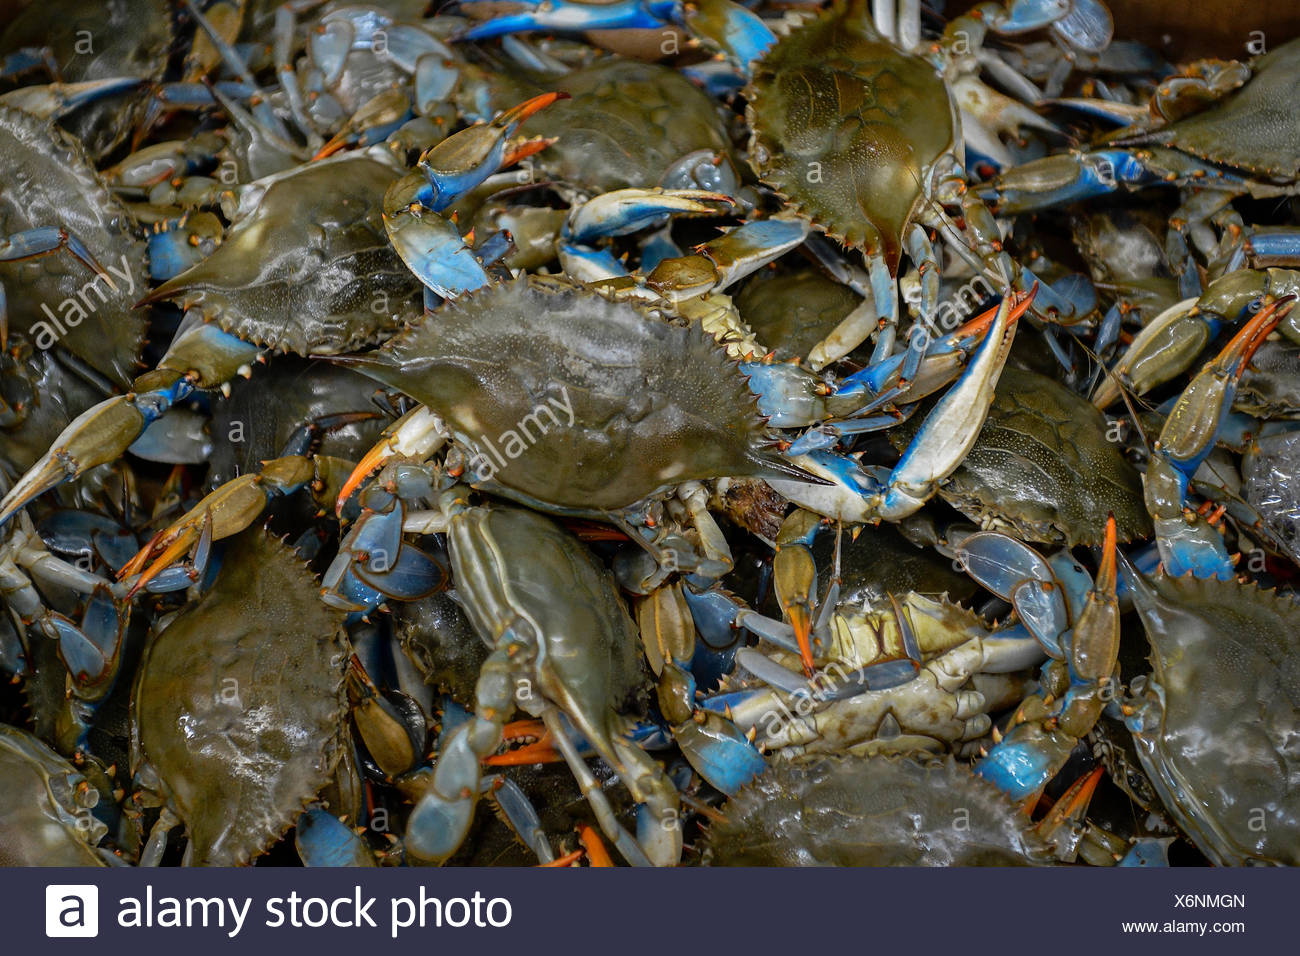 Catch of live Atlantic blue crabs. - Stock Image